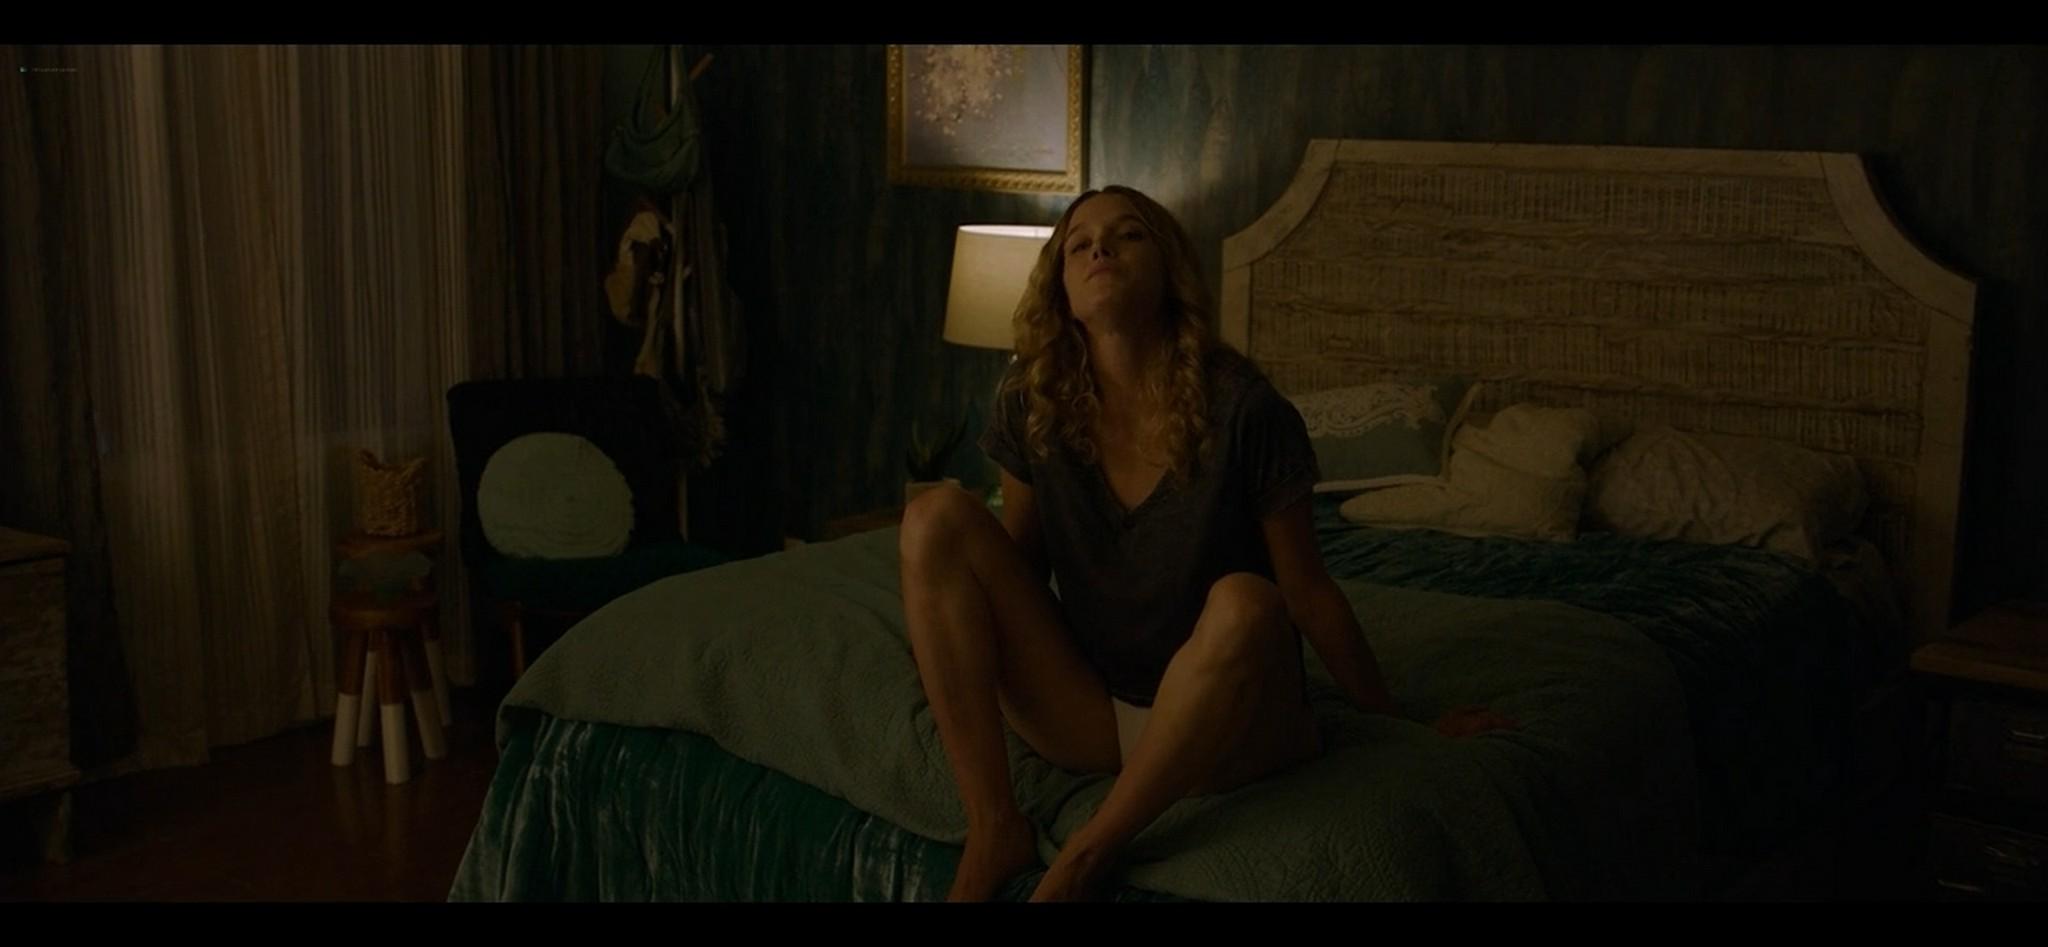 Dana Drori nude topless and sex Into the Dark Tentacles s2e11 720p 13